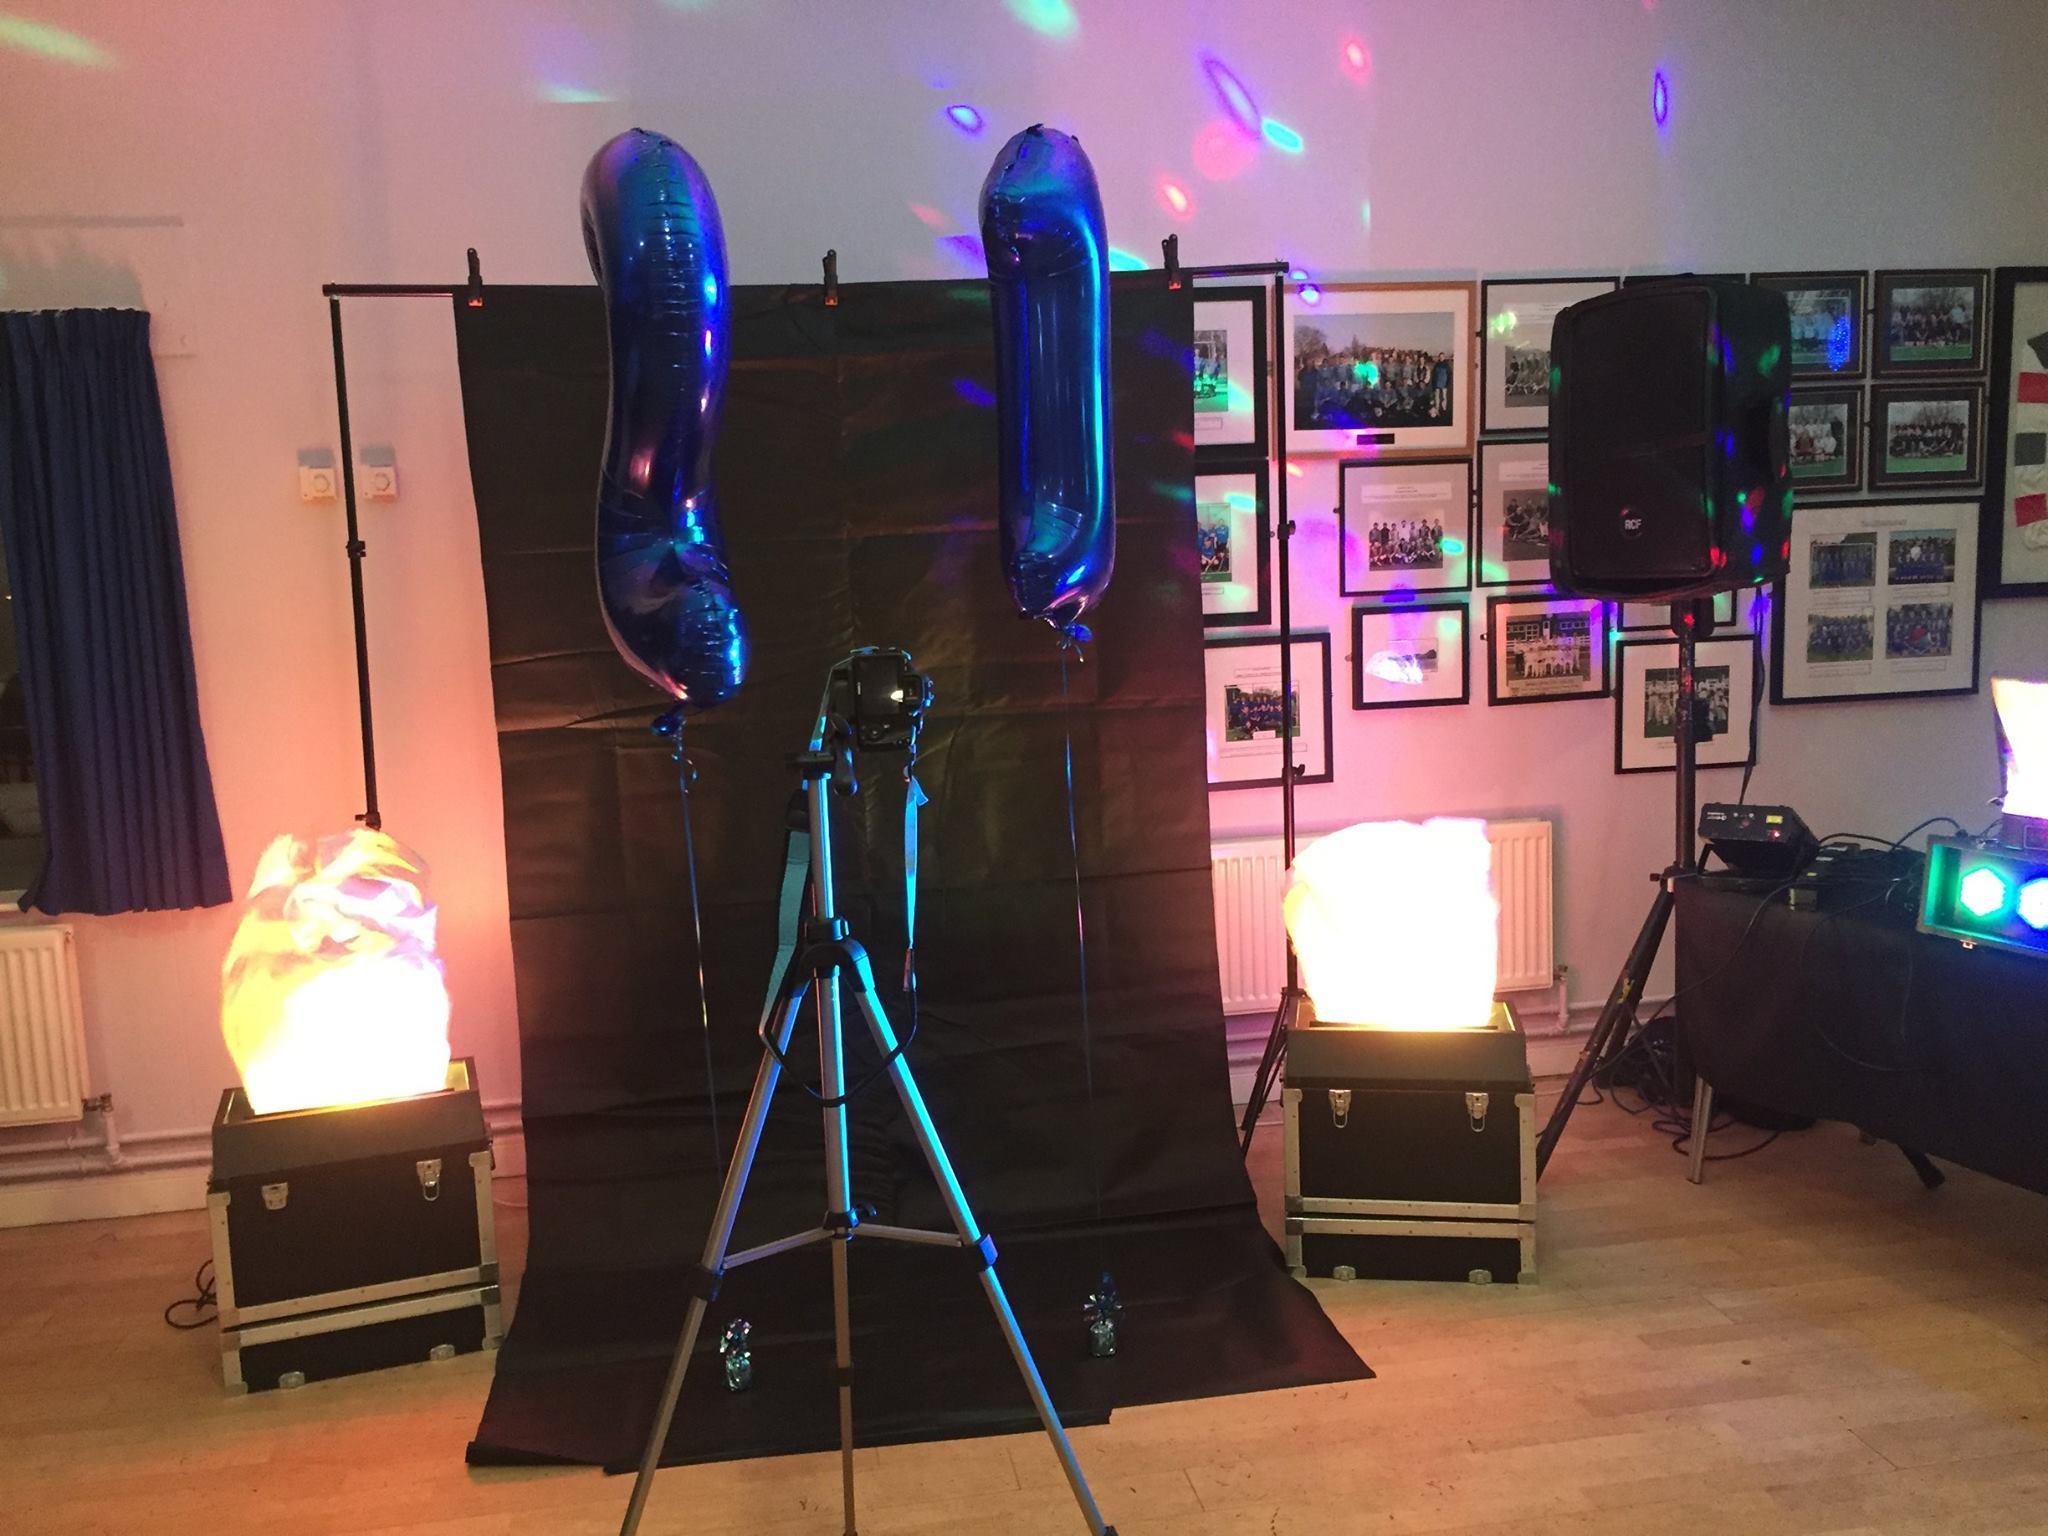 21st Birthday at Timperley Sports Club